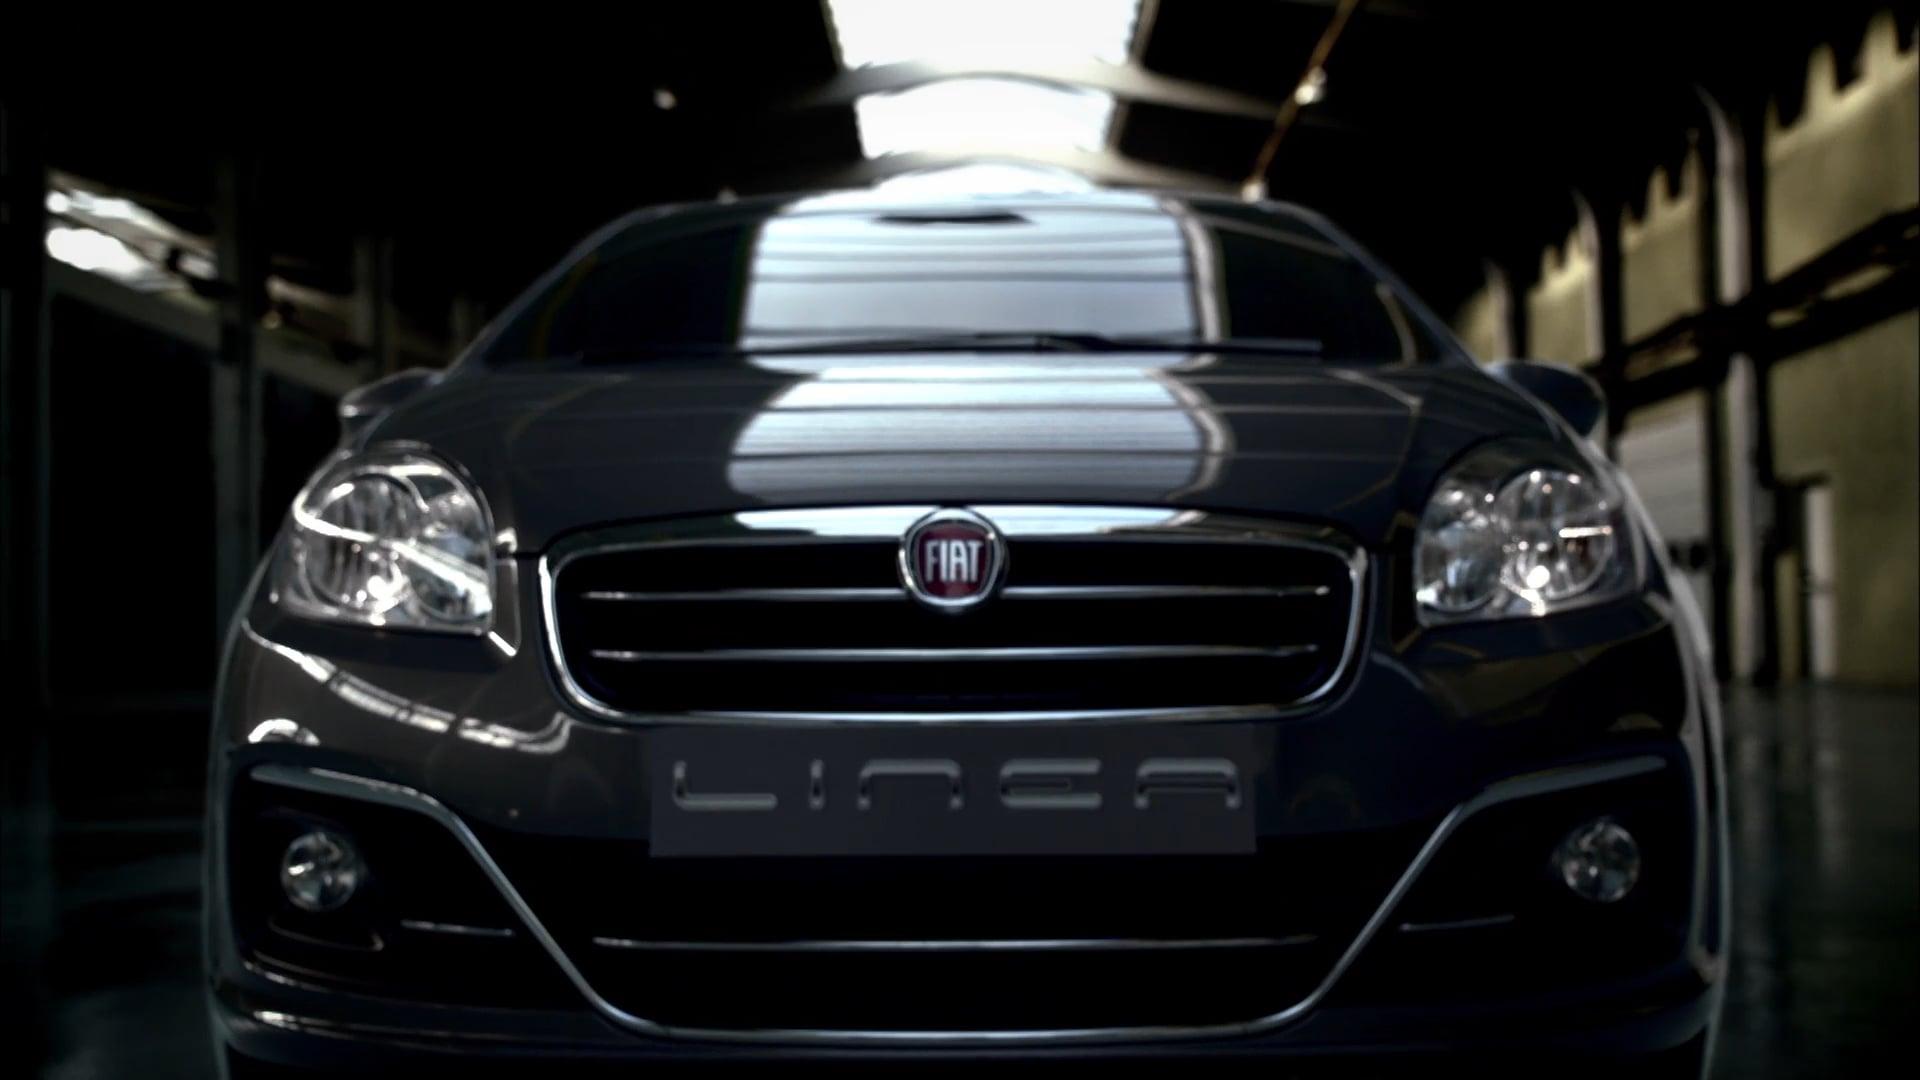 Cenk Alpsan-Fiat Linea HD